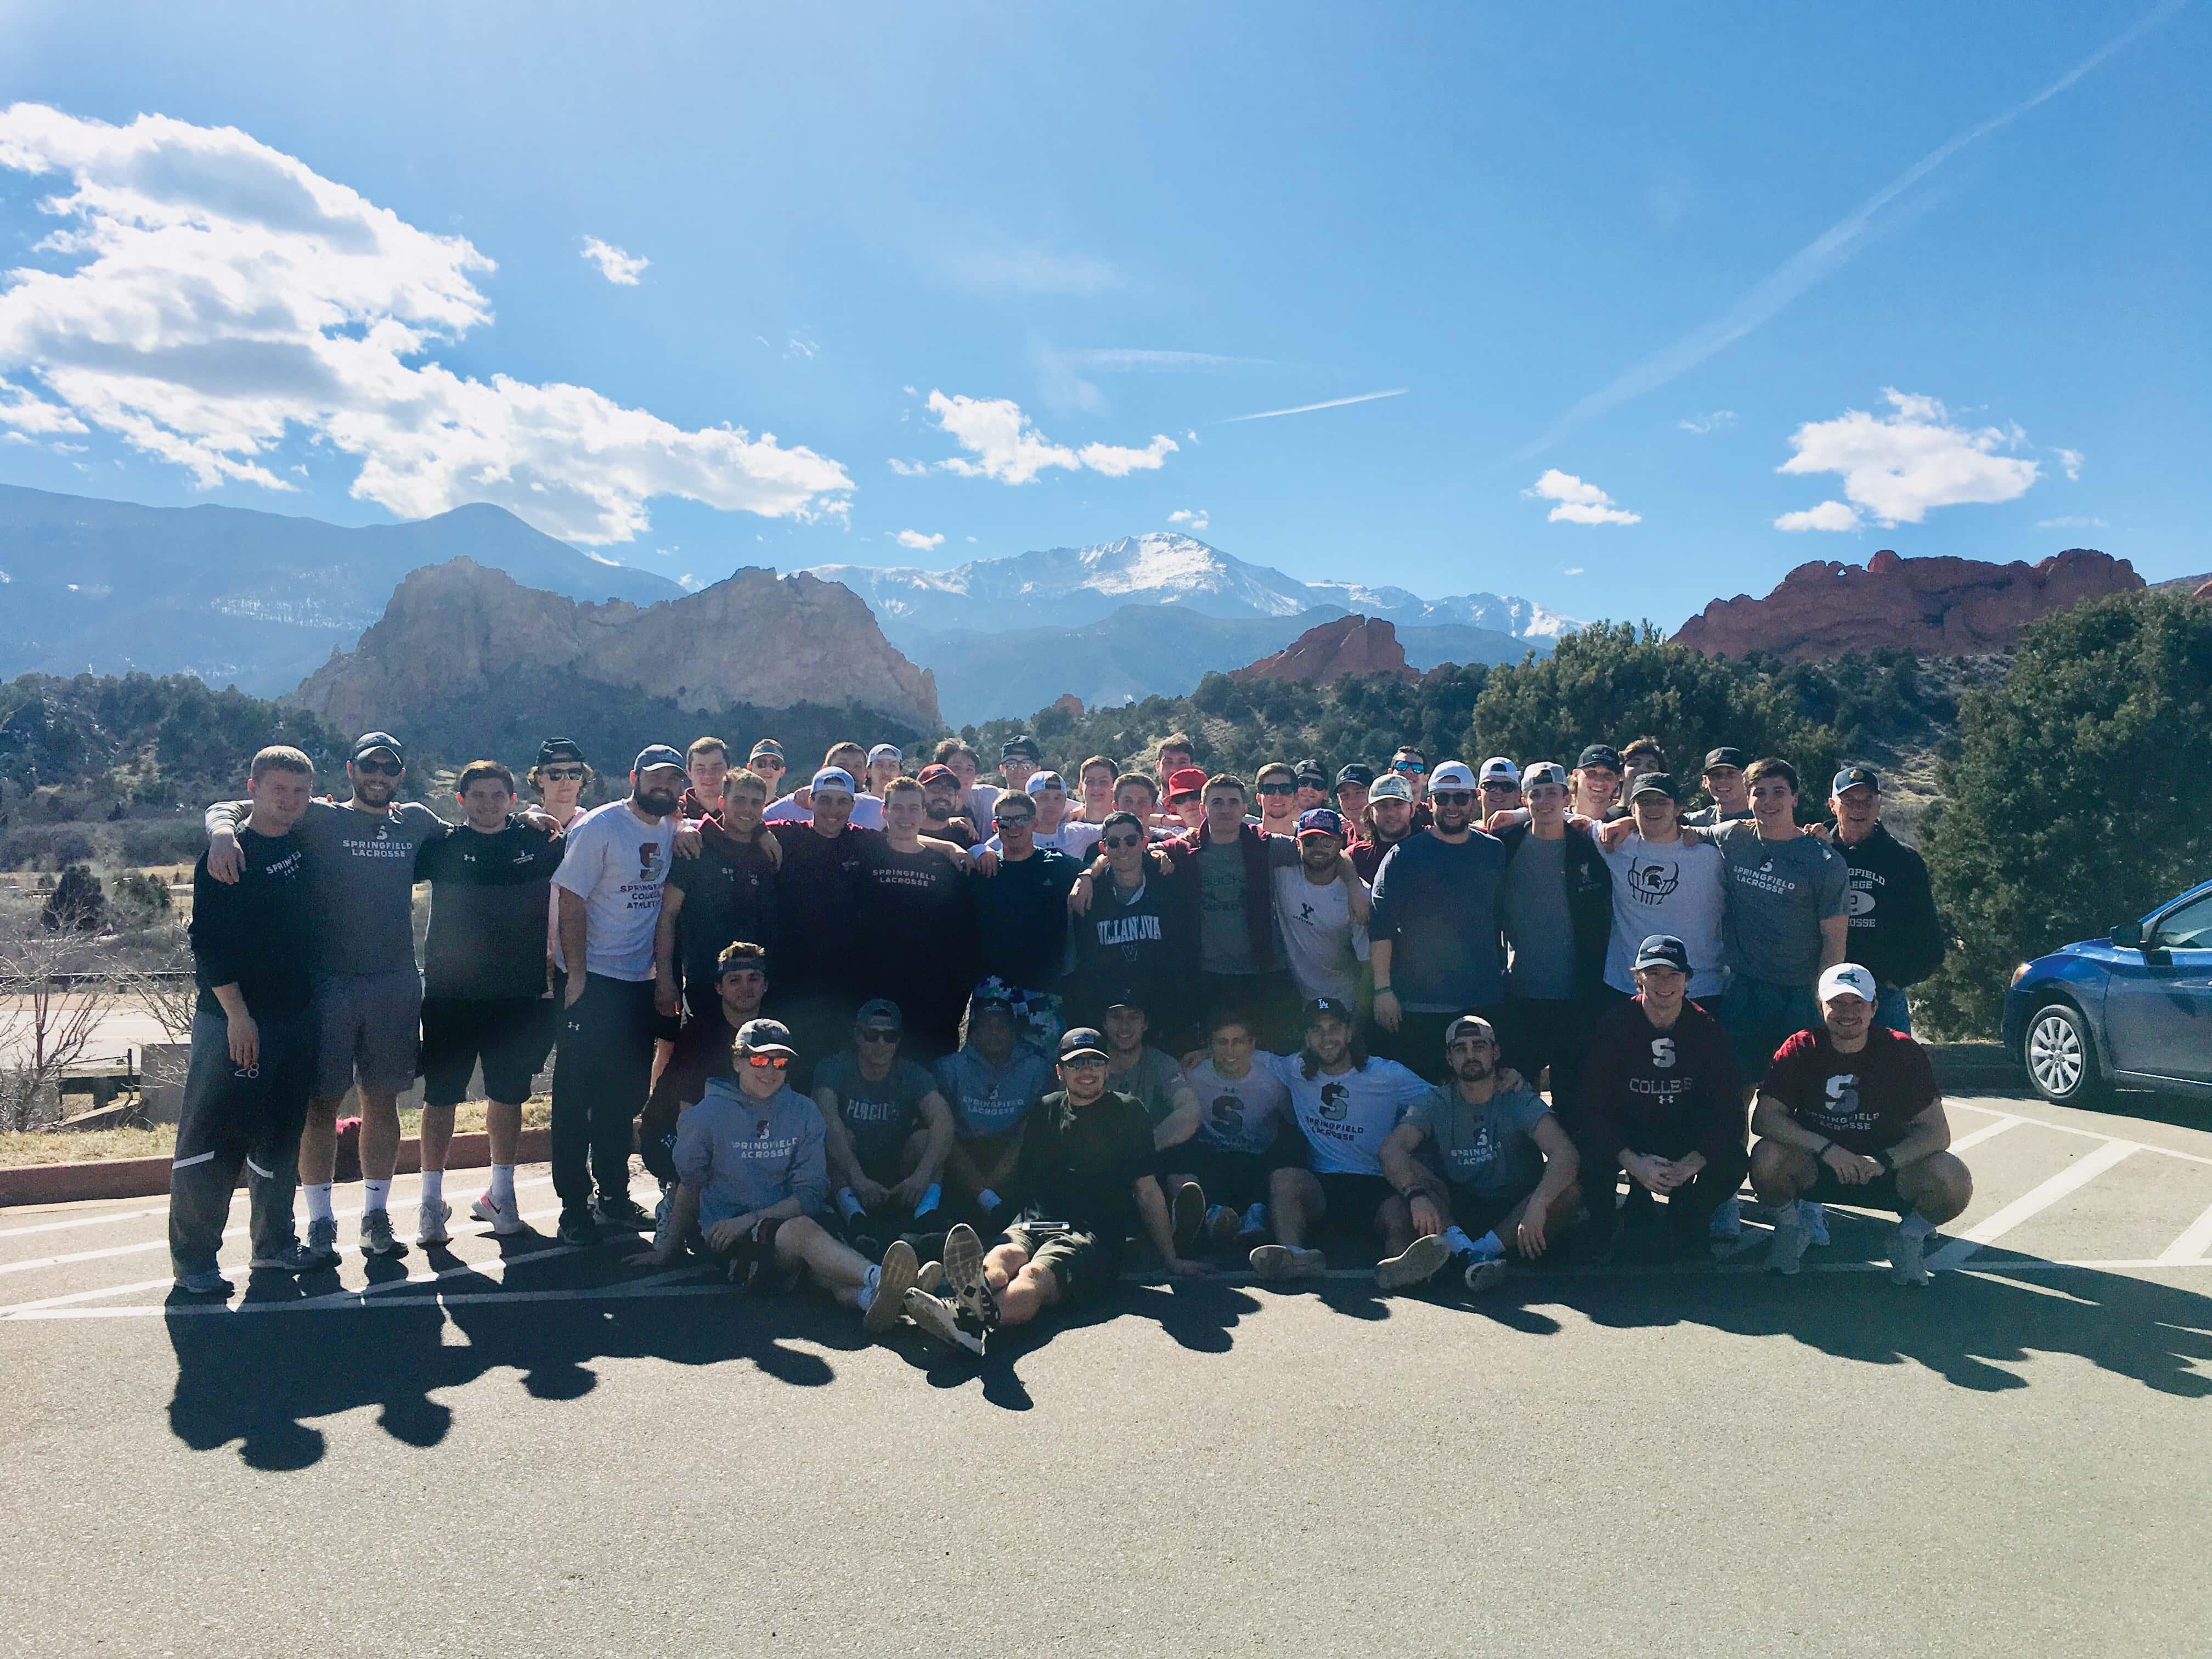 Men's lacrosse team in Colorado during spring break 2019